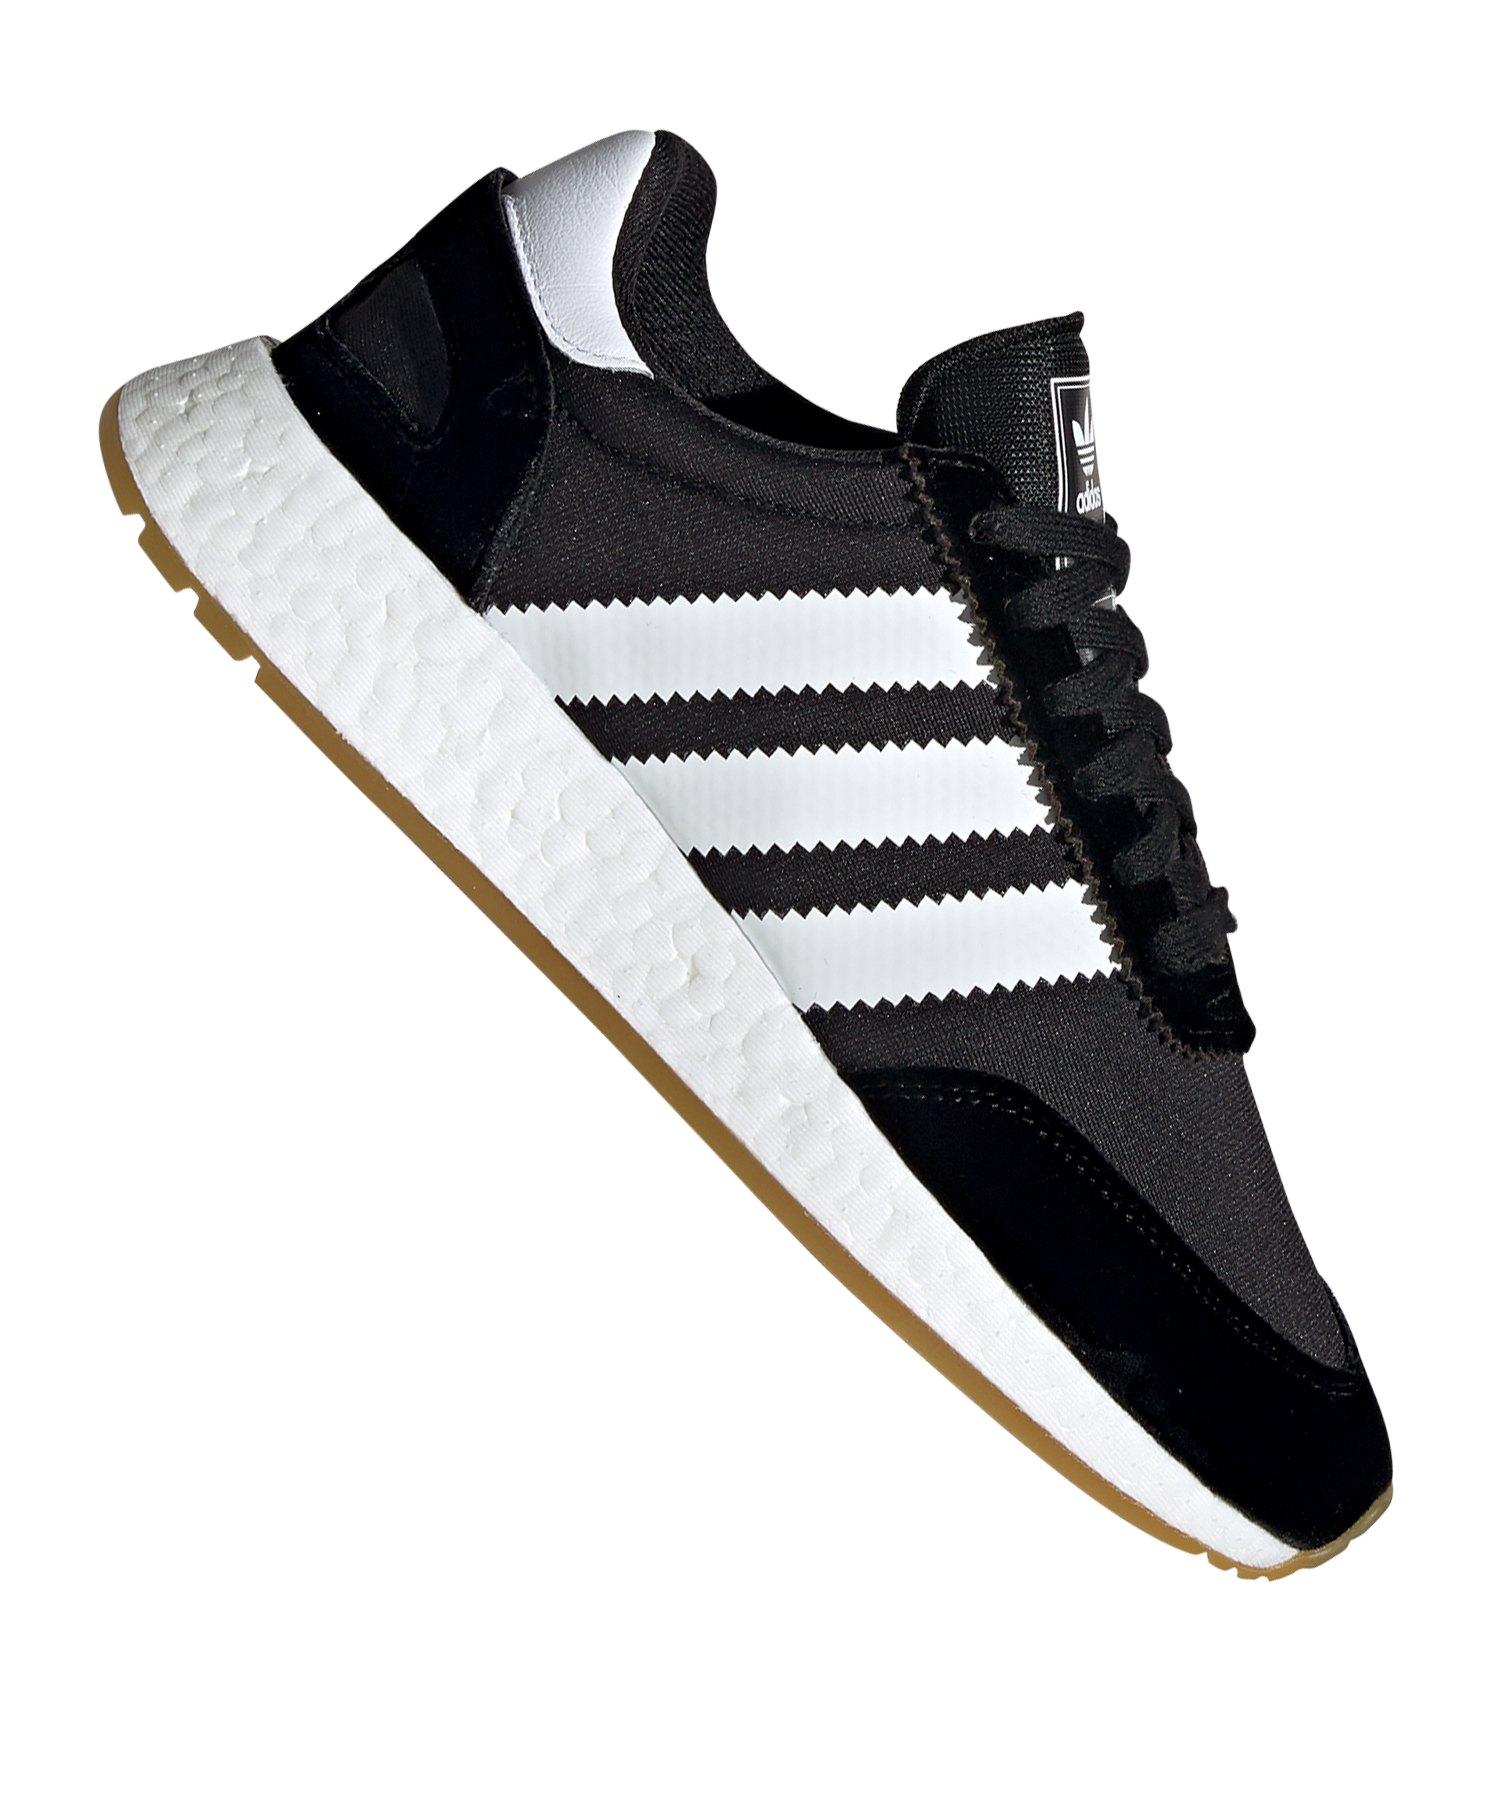 adidas Originals Turnschuhe Schuhe Damen Sneaker VC 1000